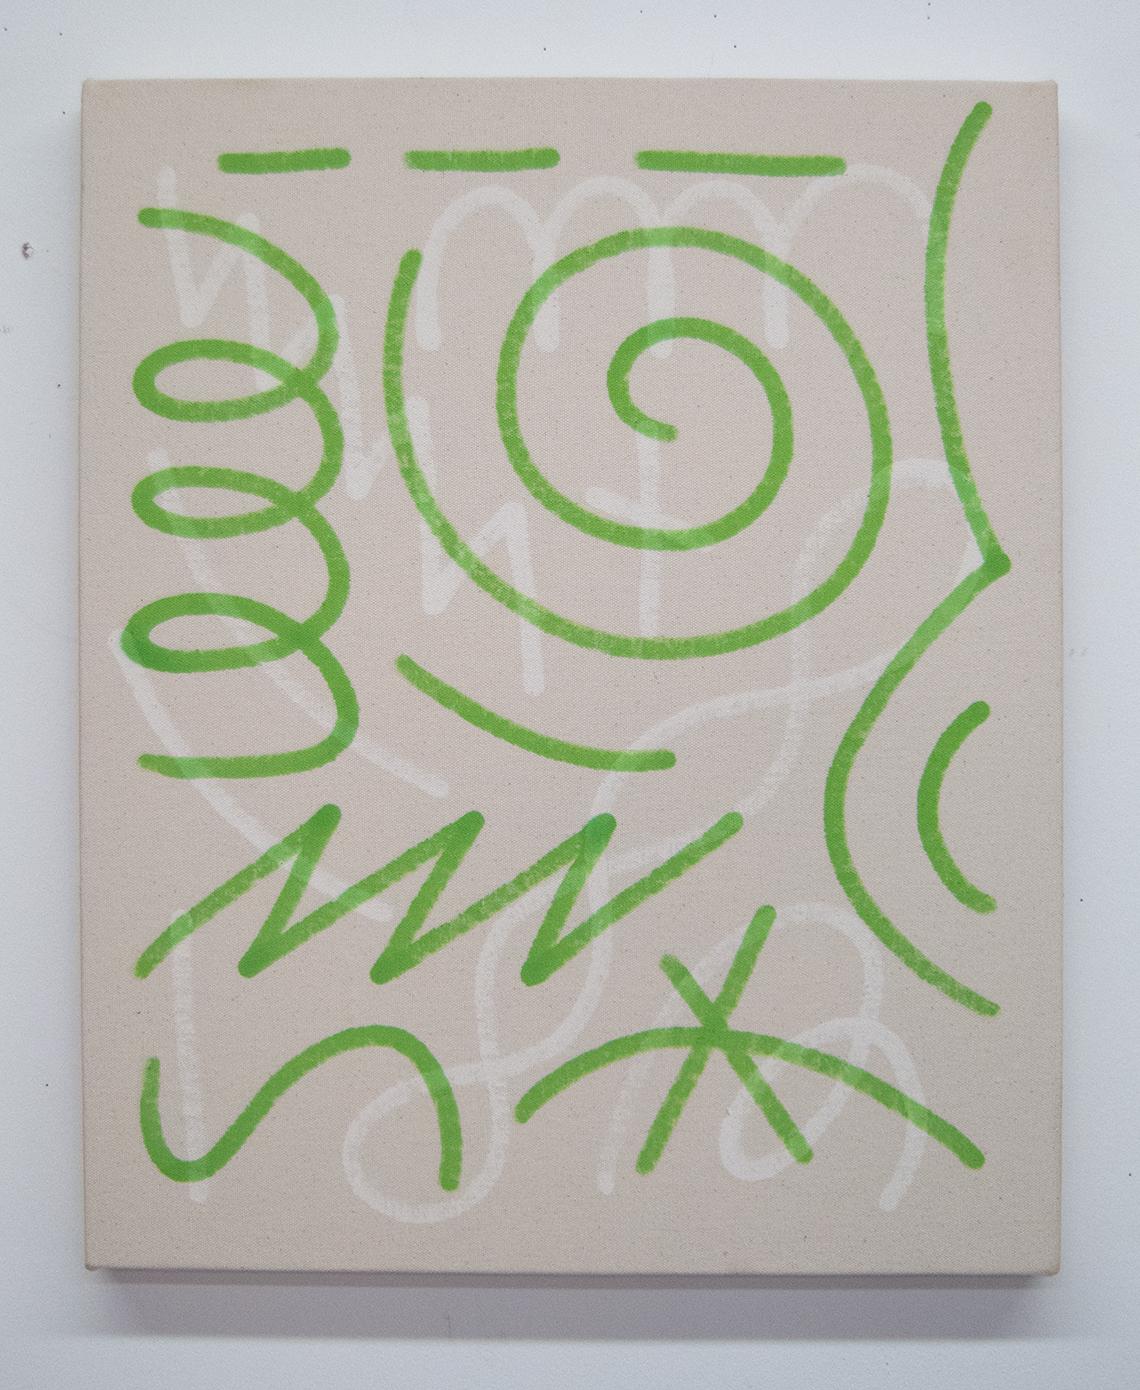 chadkouri-freeartsnyc-uprise-18x22-green